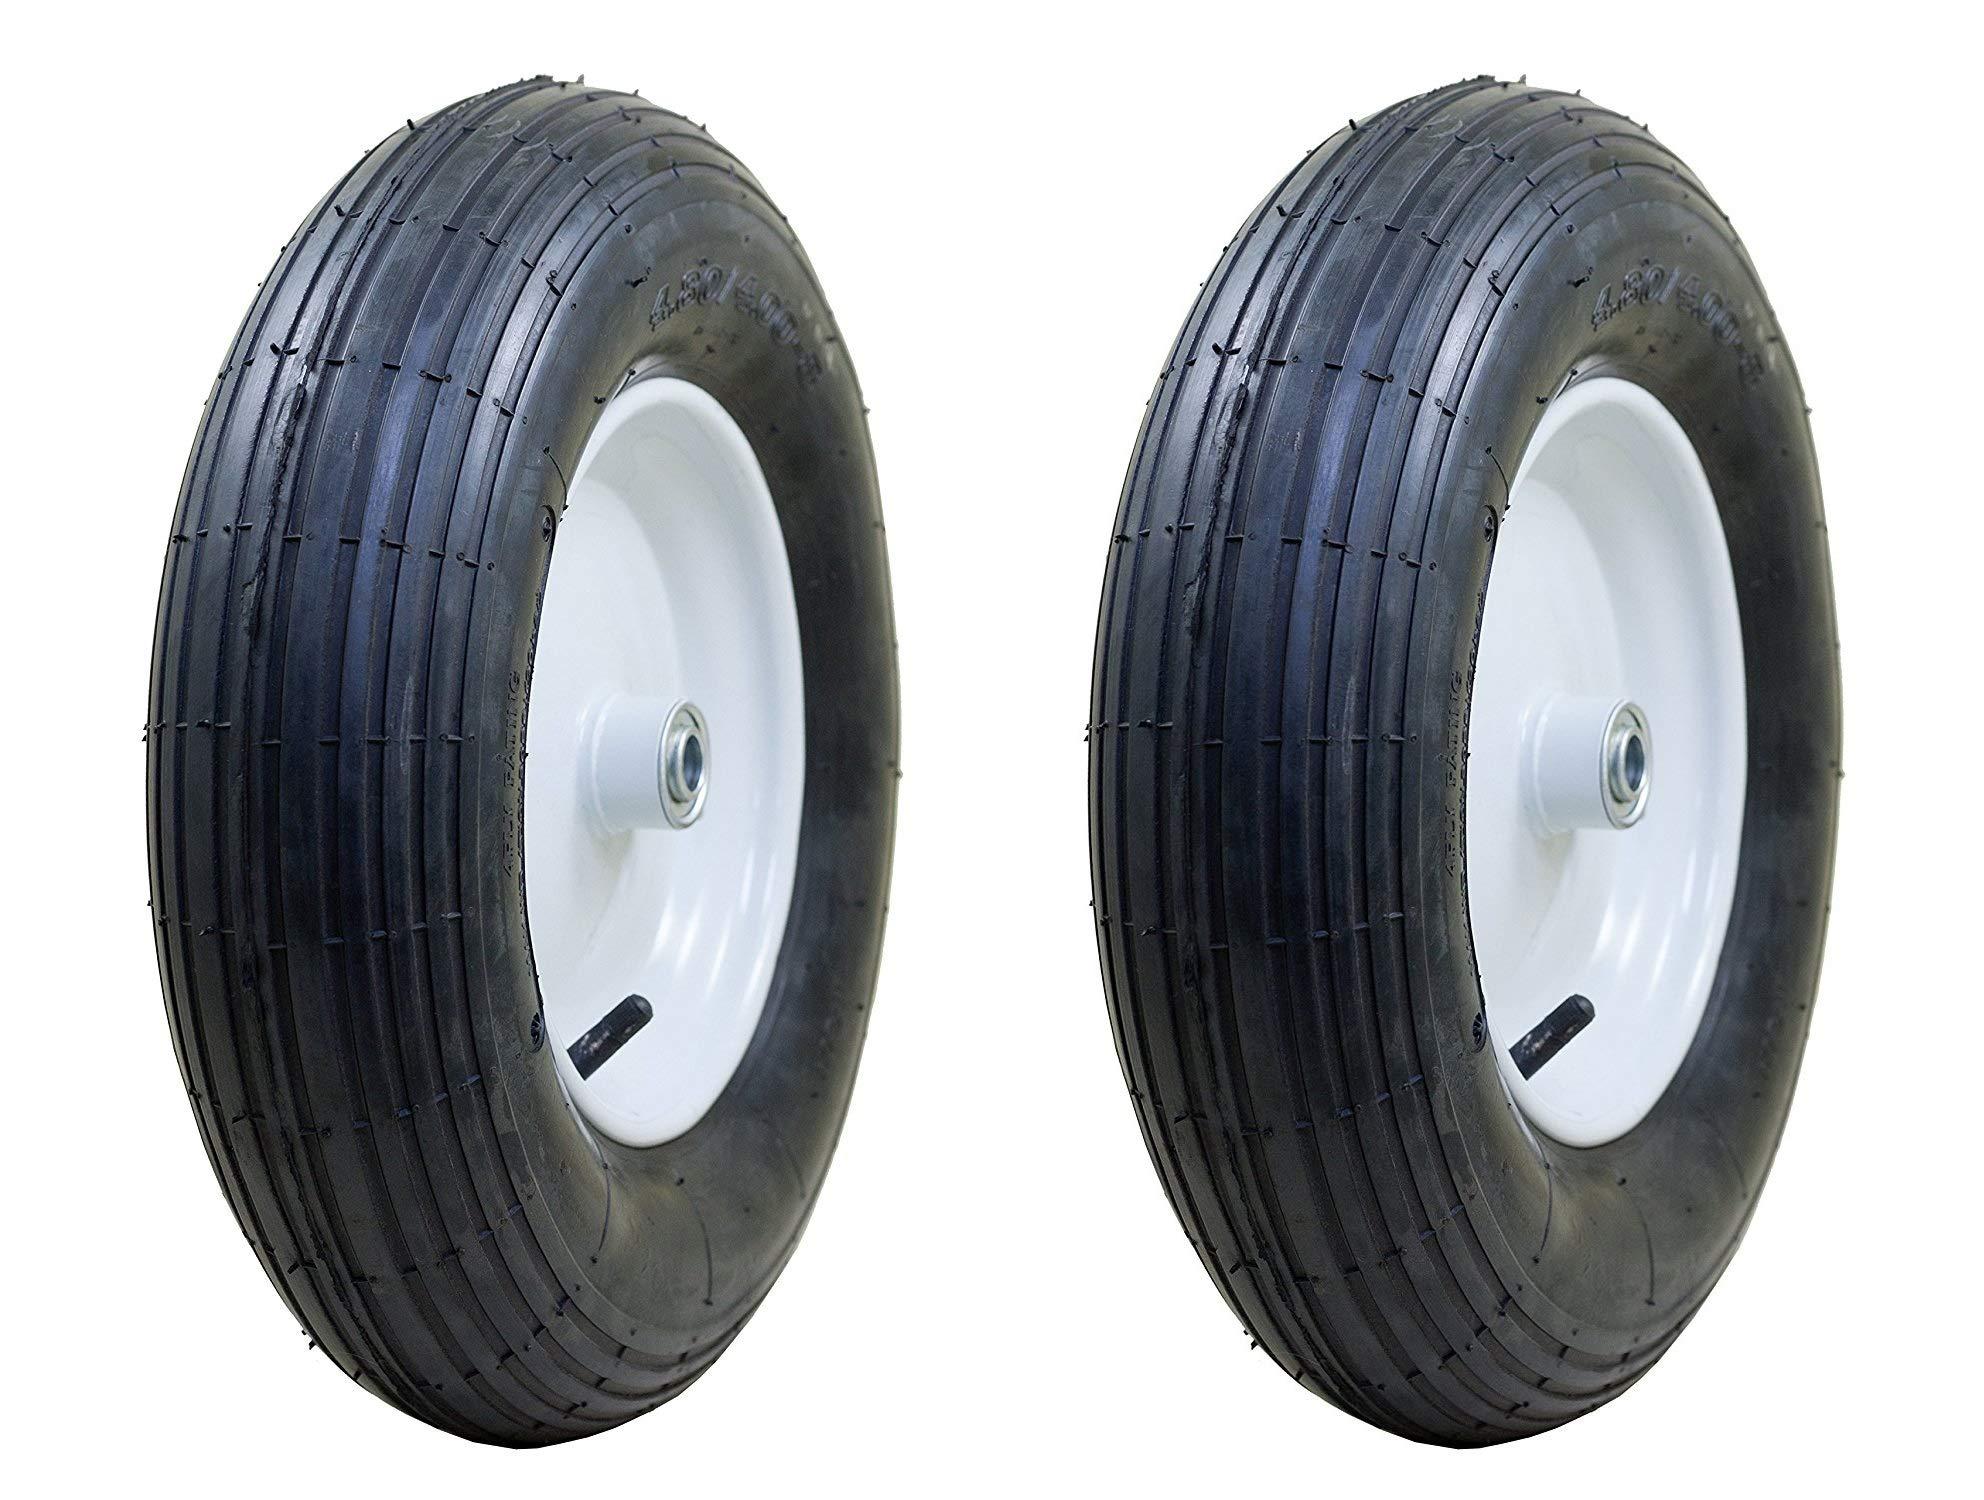 Marathon 4.80/4.00-8'' Pneumatic (Air Filled) Tire on Wheel, 3'' Hub, 3/4'' Bearings, Ribbed Tread (Pack of 2) by Marathon Industries